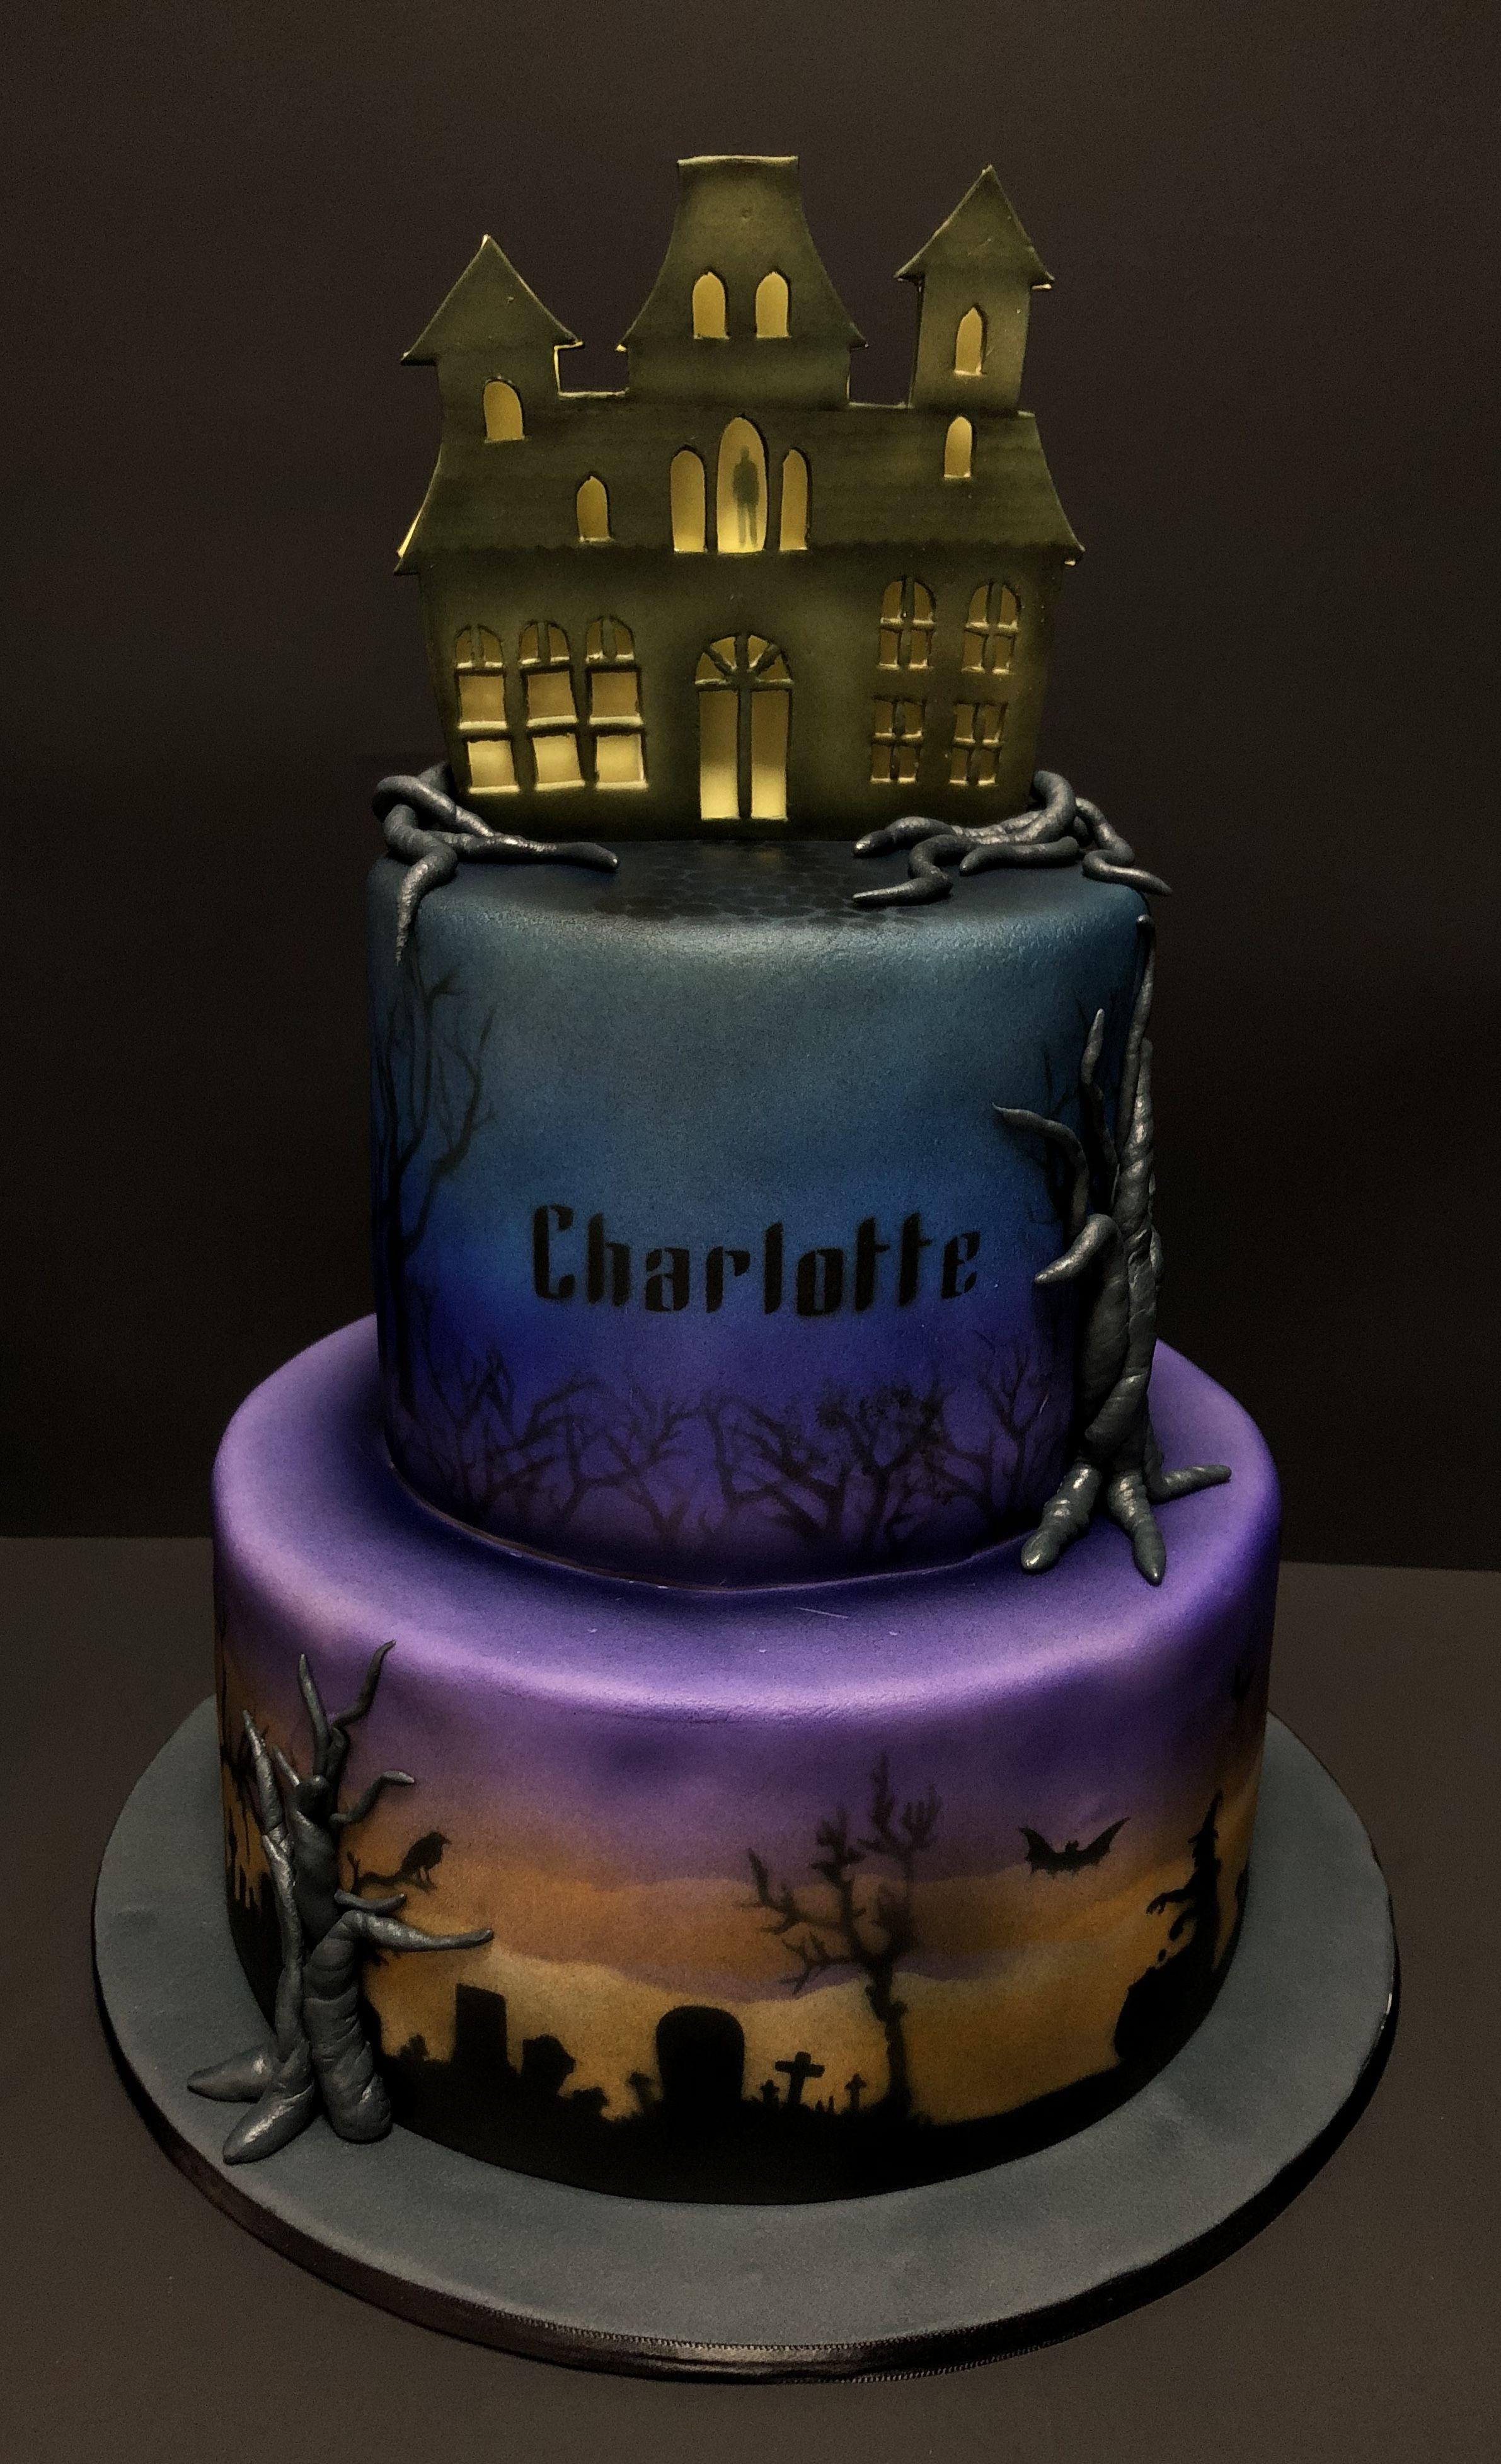 Astonishing Haunted House Birthday Cake Almond Cake With Amaretto Filling Funny Birthday Cards Online Inifofree Goldxyz